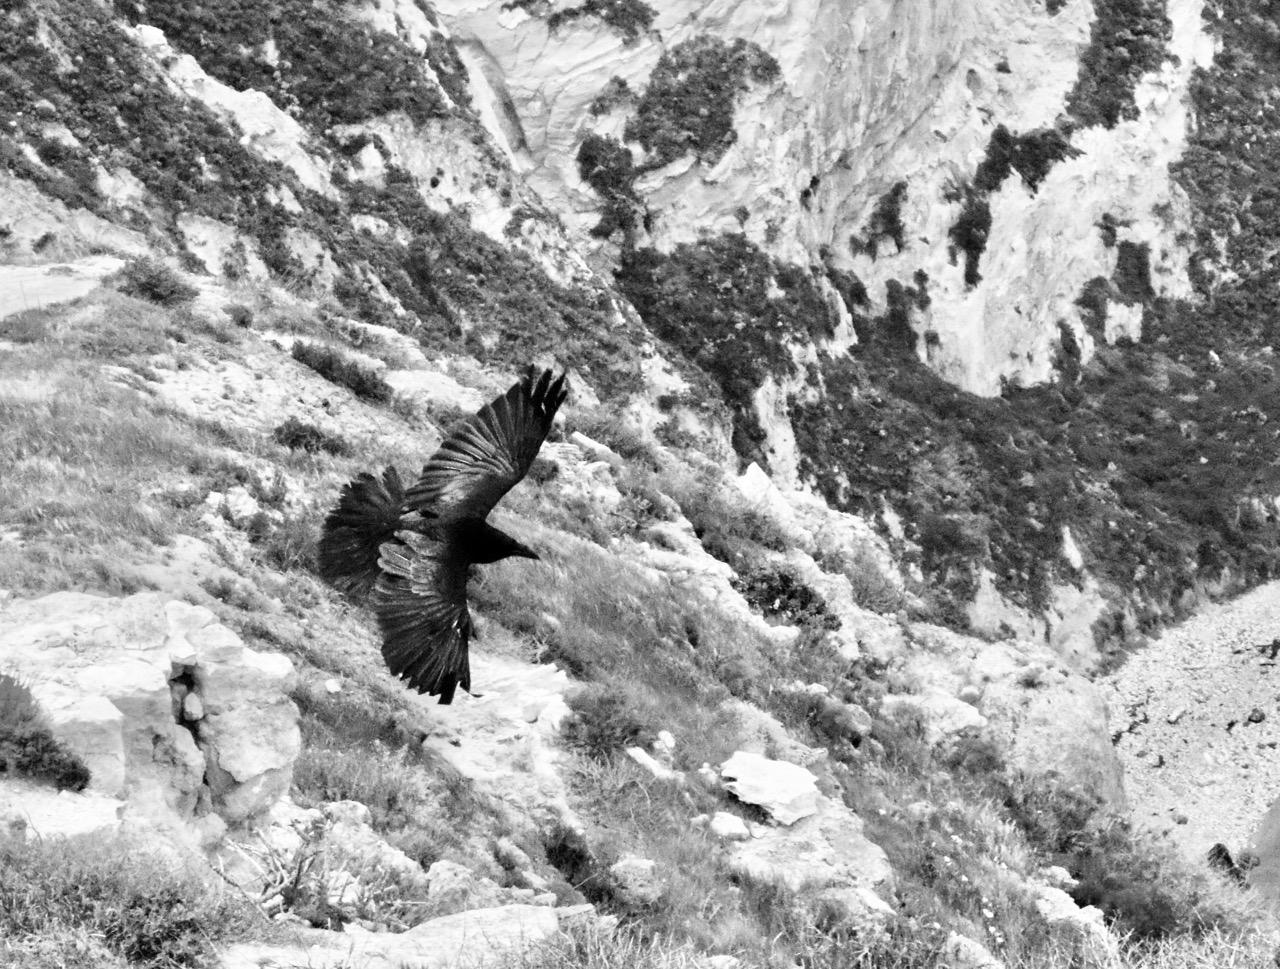 Looking Down on Raven's Flight - Santa Cruz Island, Channel Islands National Park